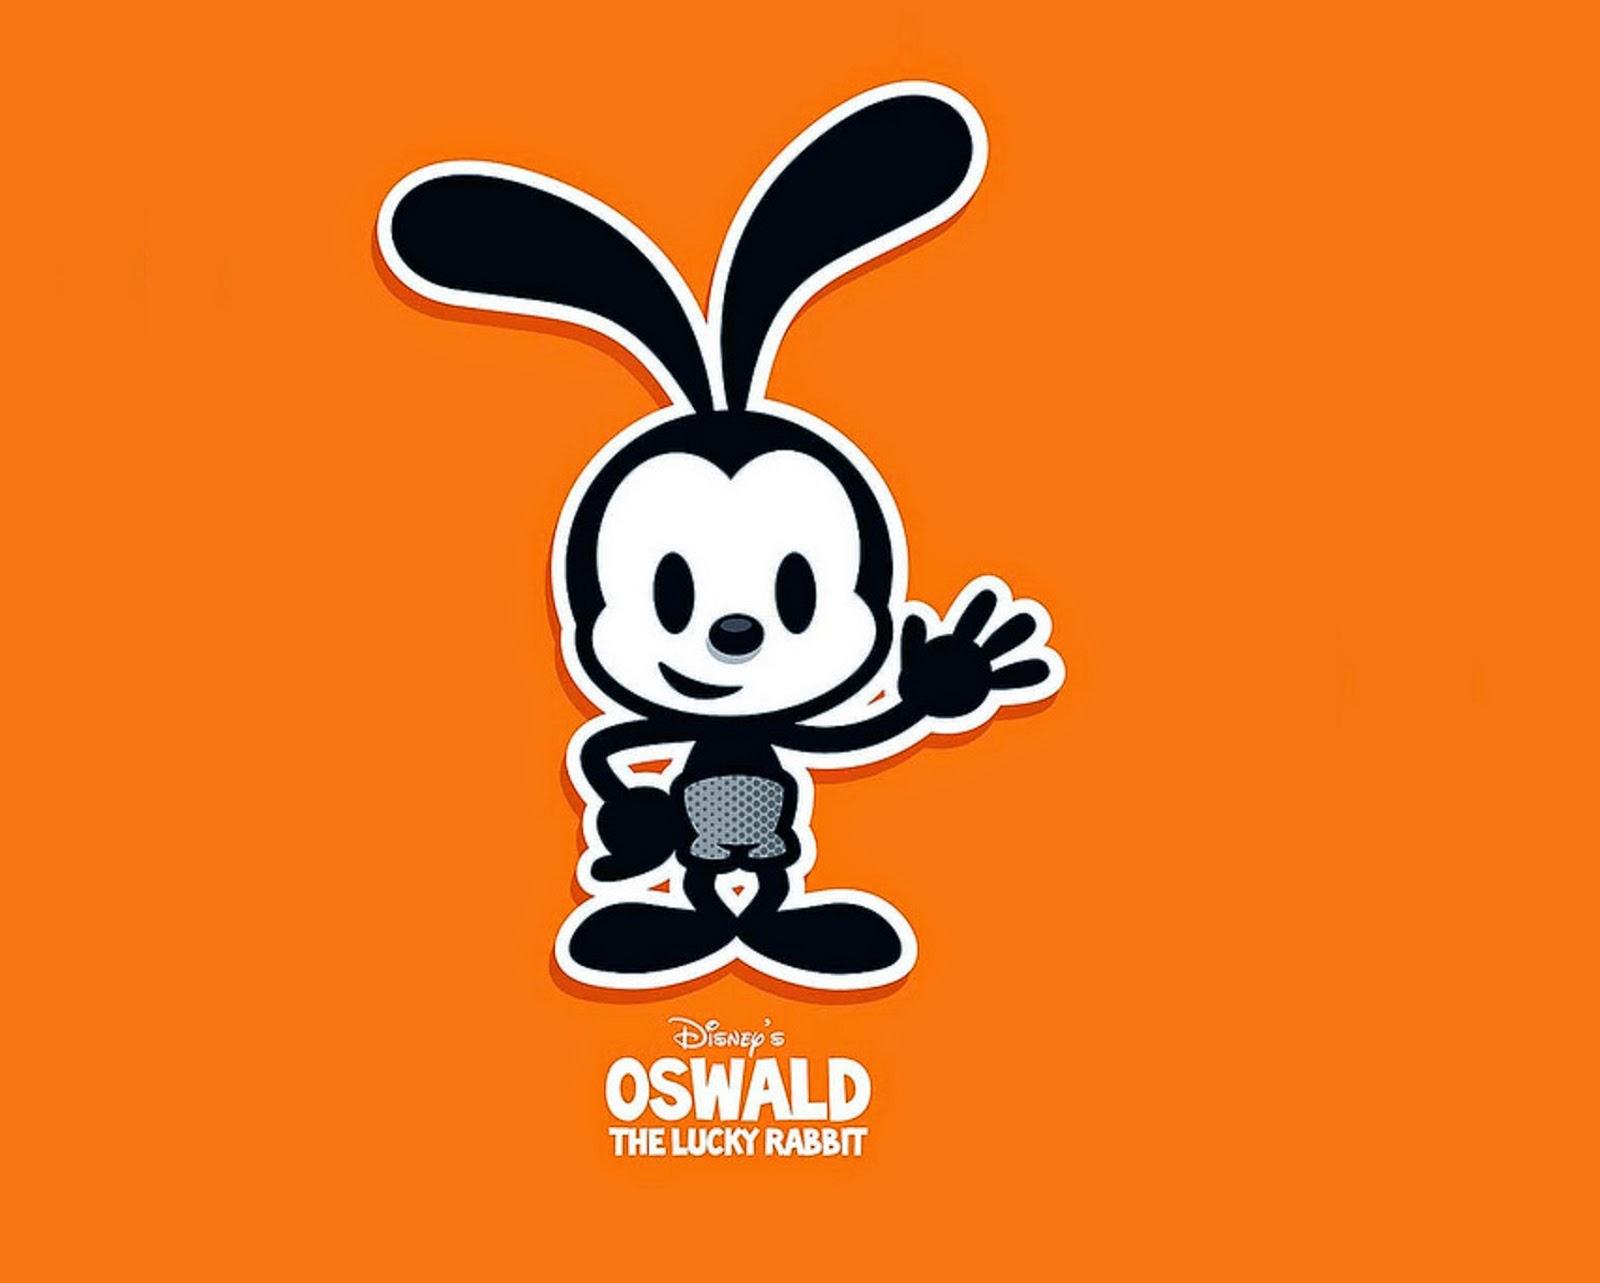 oswald wallpaper,cartoon,animated cartoon,rabbit,orange,logo